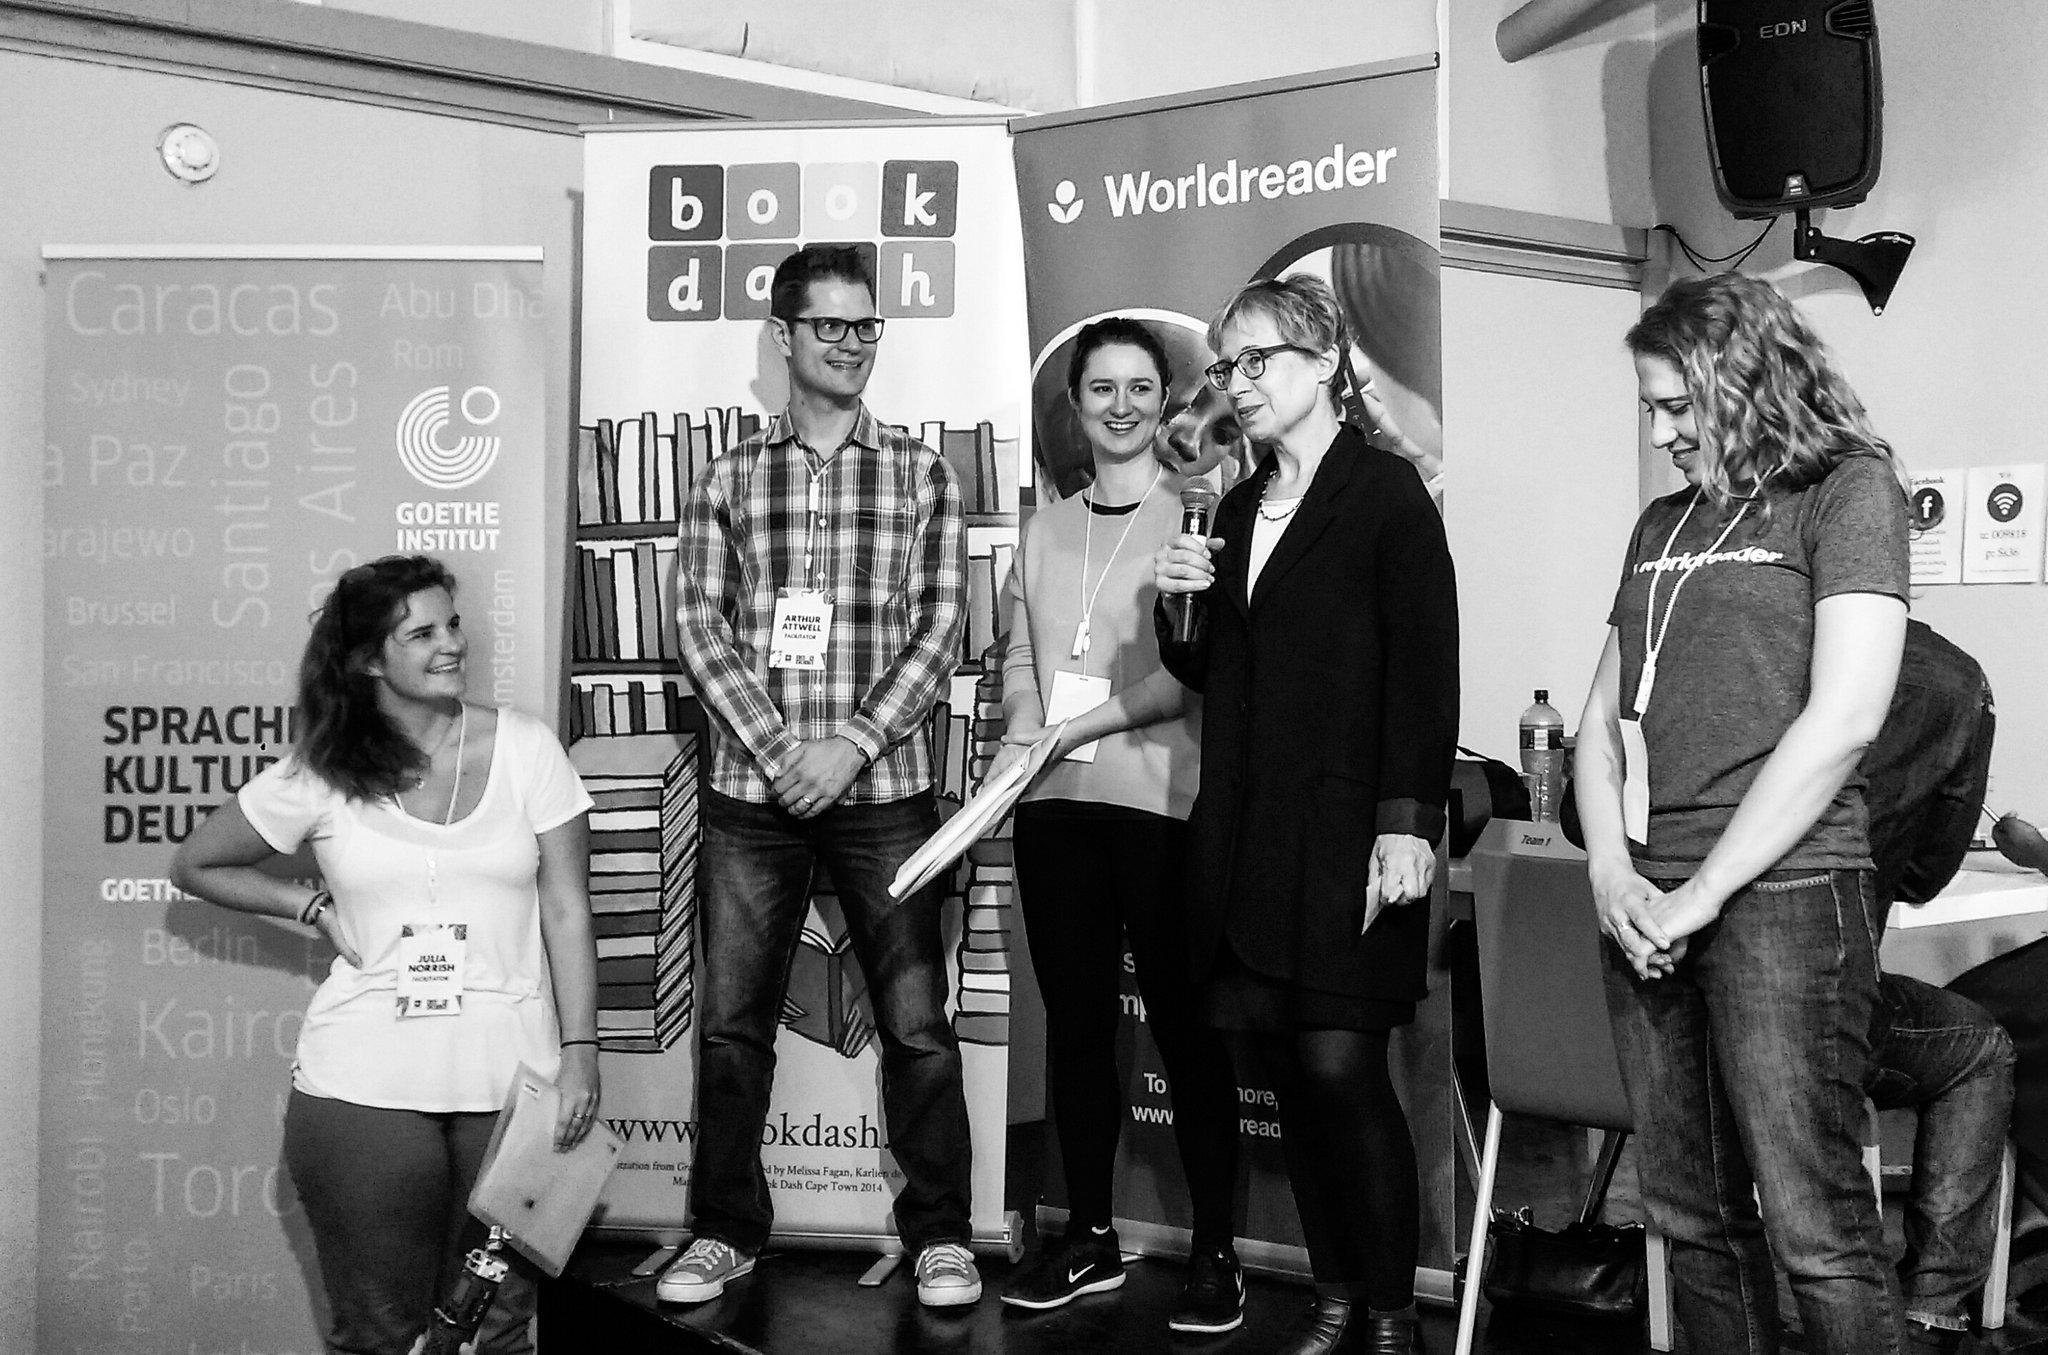 Brigitte (@goethejoburg), Julia & @arthurattwell welcoming the participants to the 9th @BookDash 👏 #BookDash #BookDashPlus @worldreaders https://t.co/4vKL2Z799m